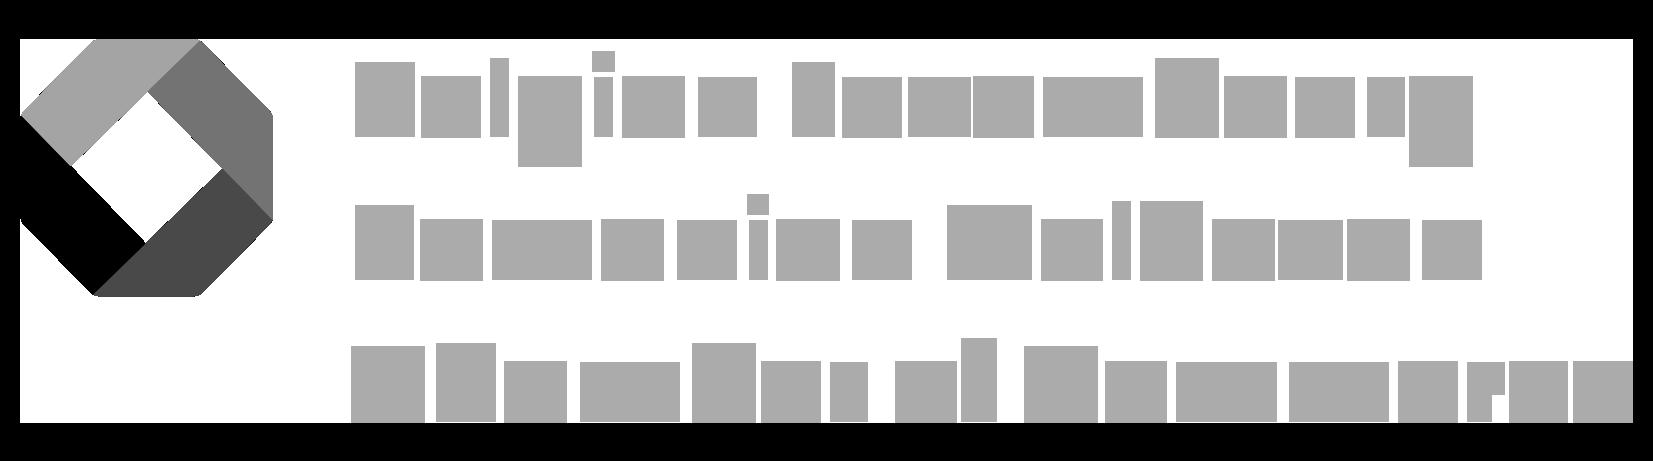 Belgian Luxembourg Romanian Moldovan Chamber of Commerce logo